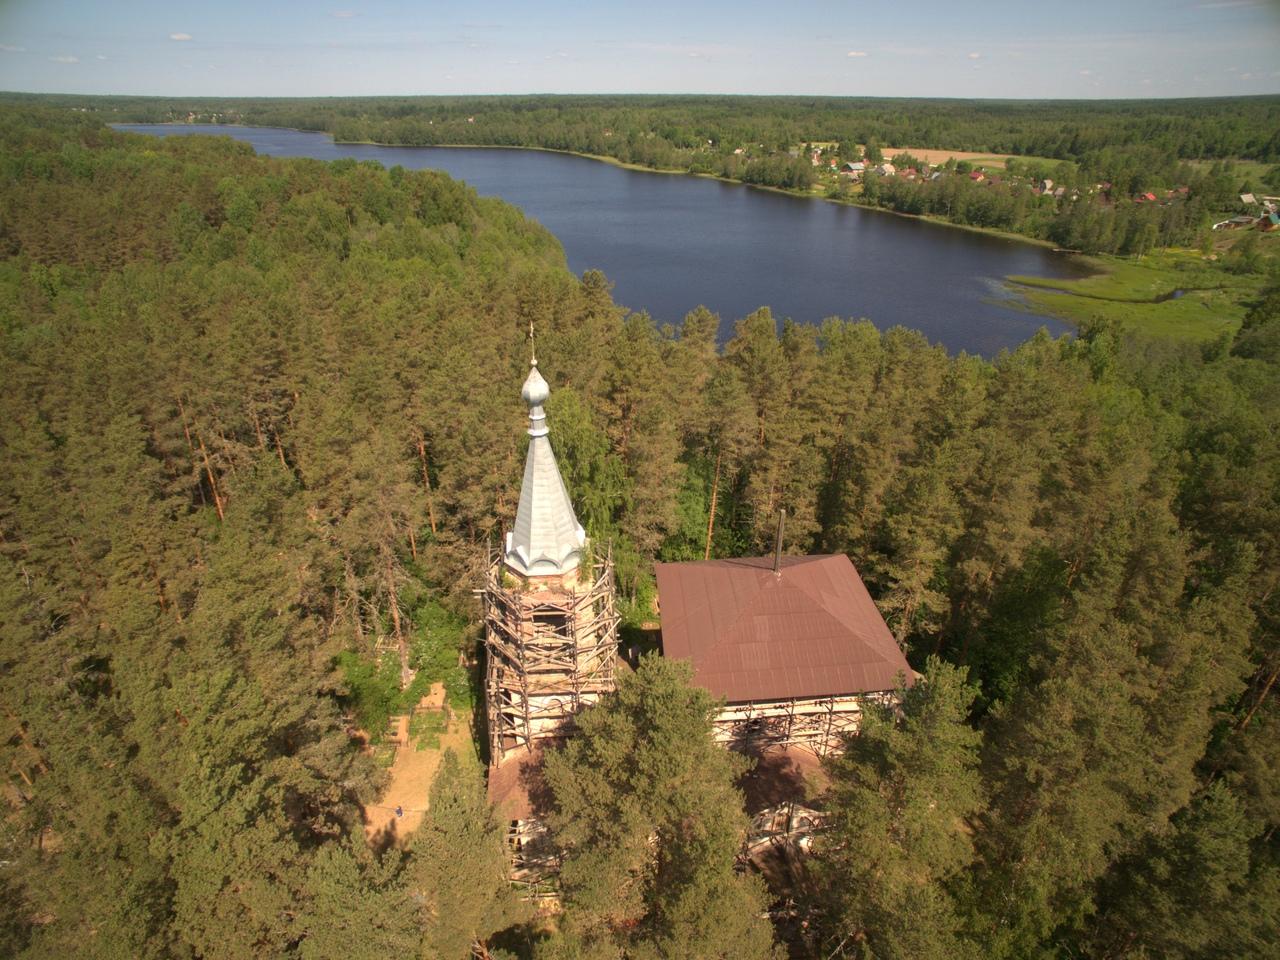 Храм Михаила Архангела на озере Долгом. Фото: http://архангелмихаил.рф